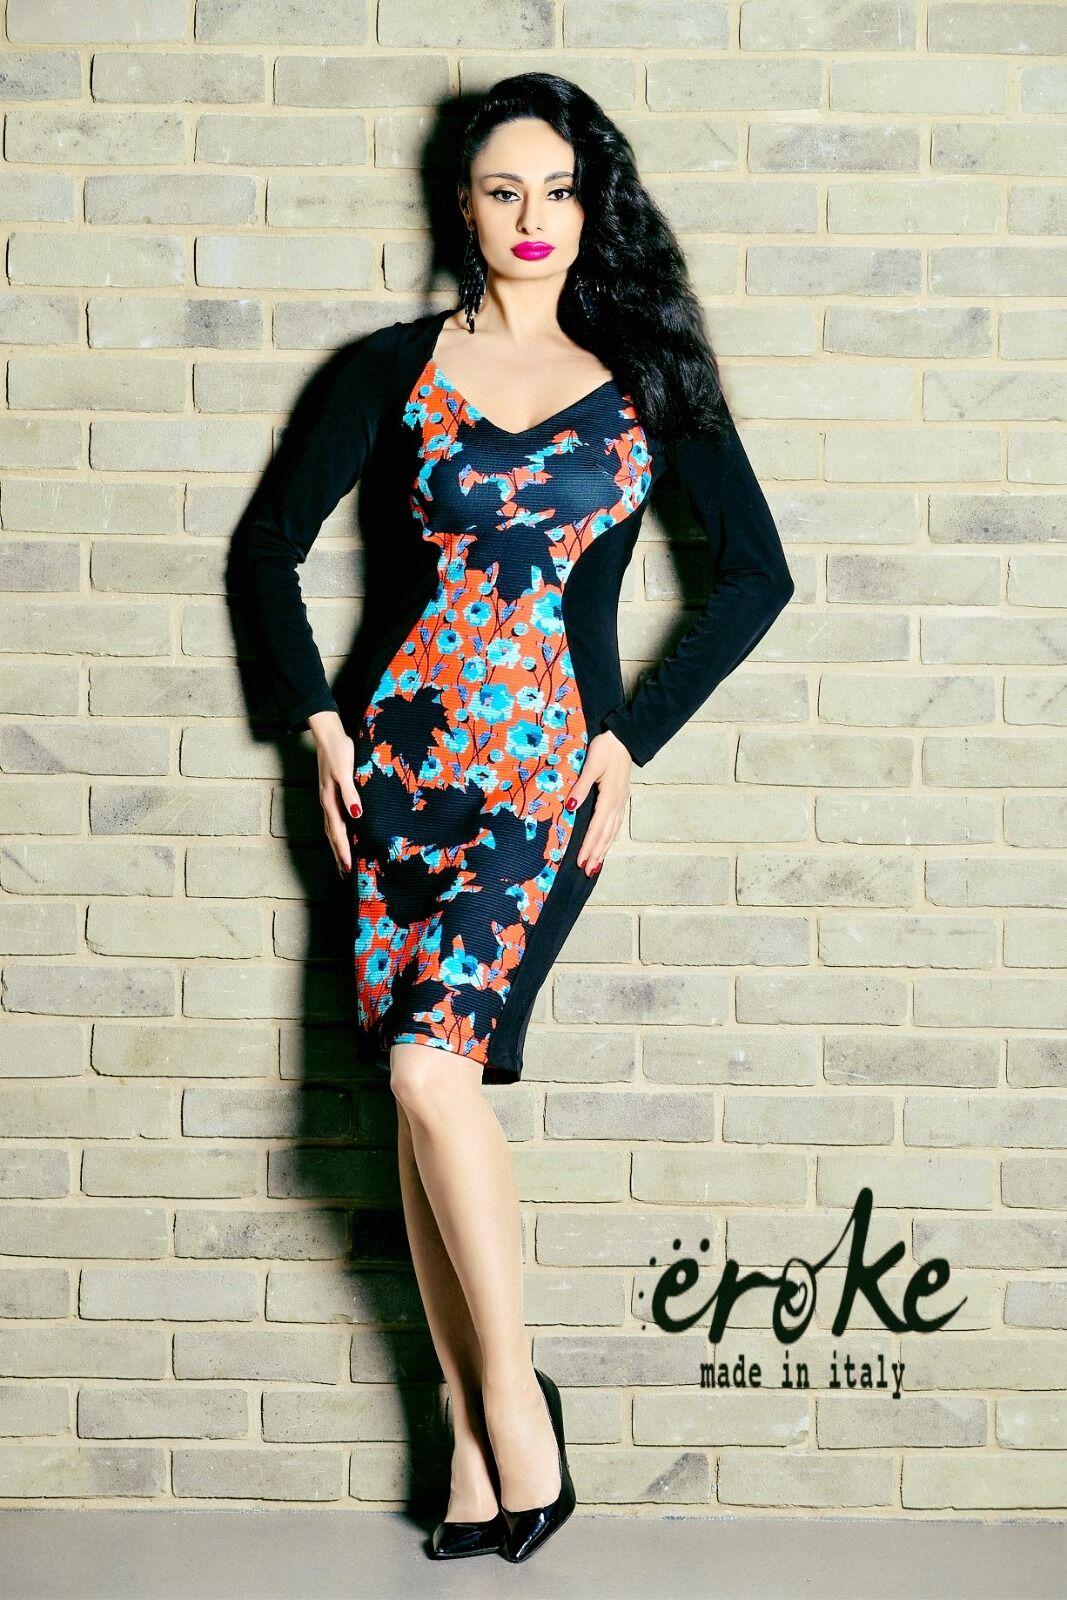 Eroke